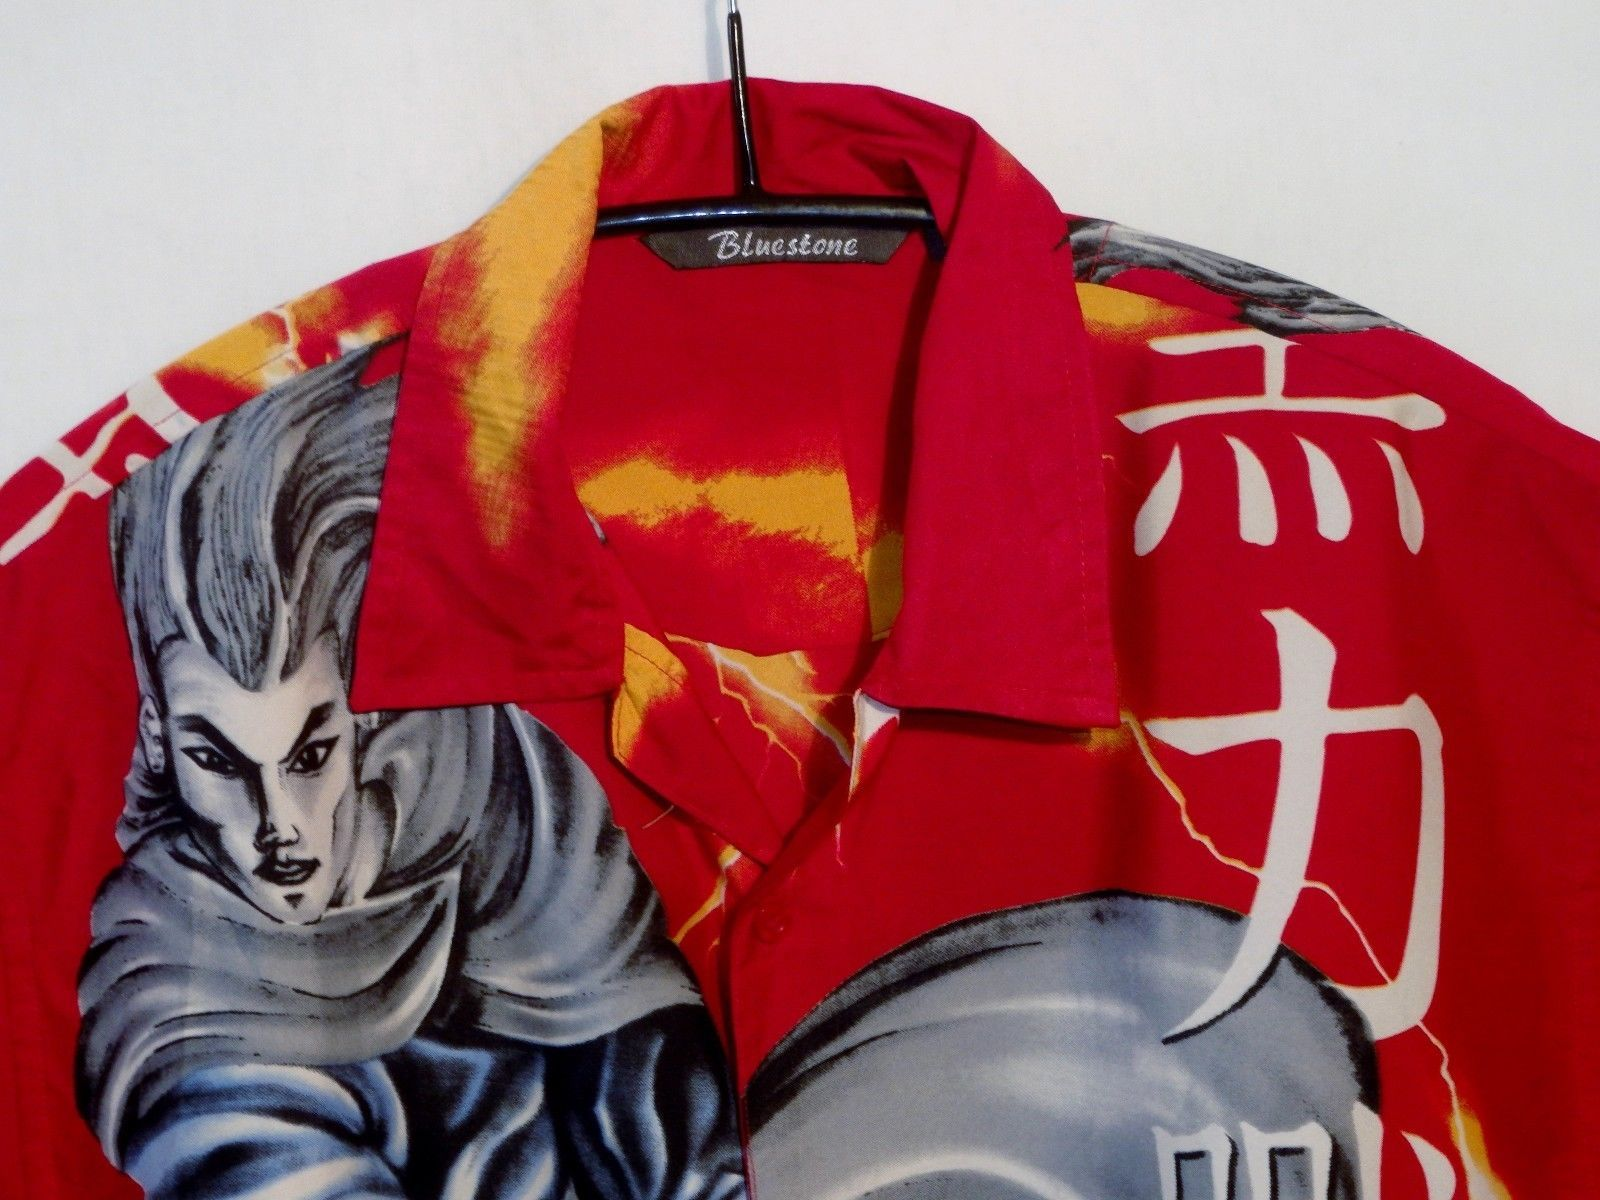 Bluestone samurai anime manga hawaiian shirt uk xl us l